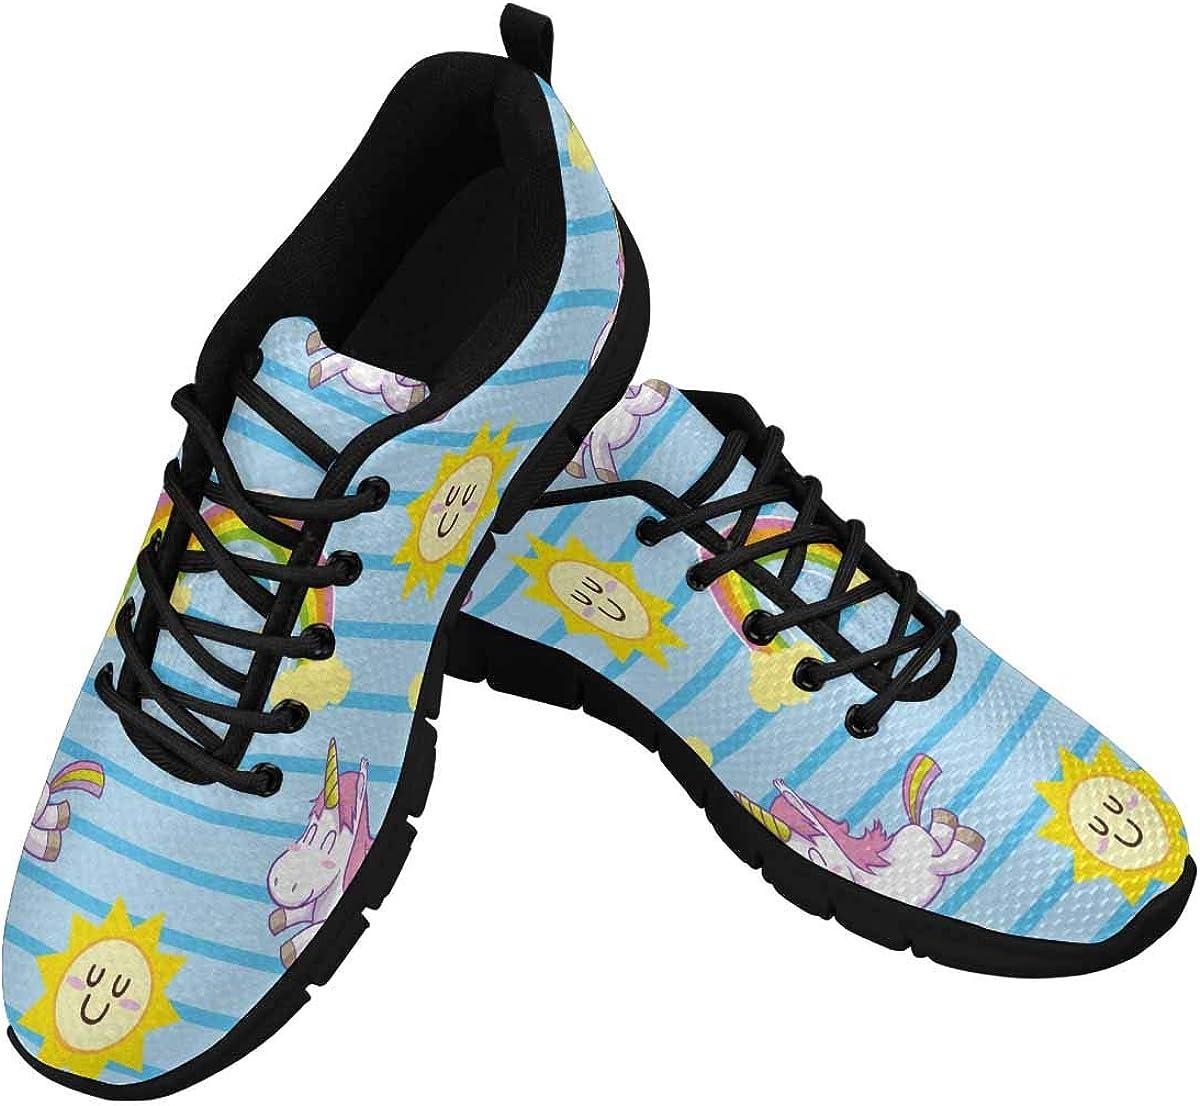 InterestPrint Unicorn Rainbow Sun Women Walking Shoes Comfortable Lightweight Work Casual Travel Sneakers